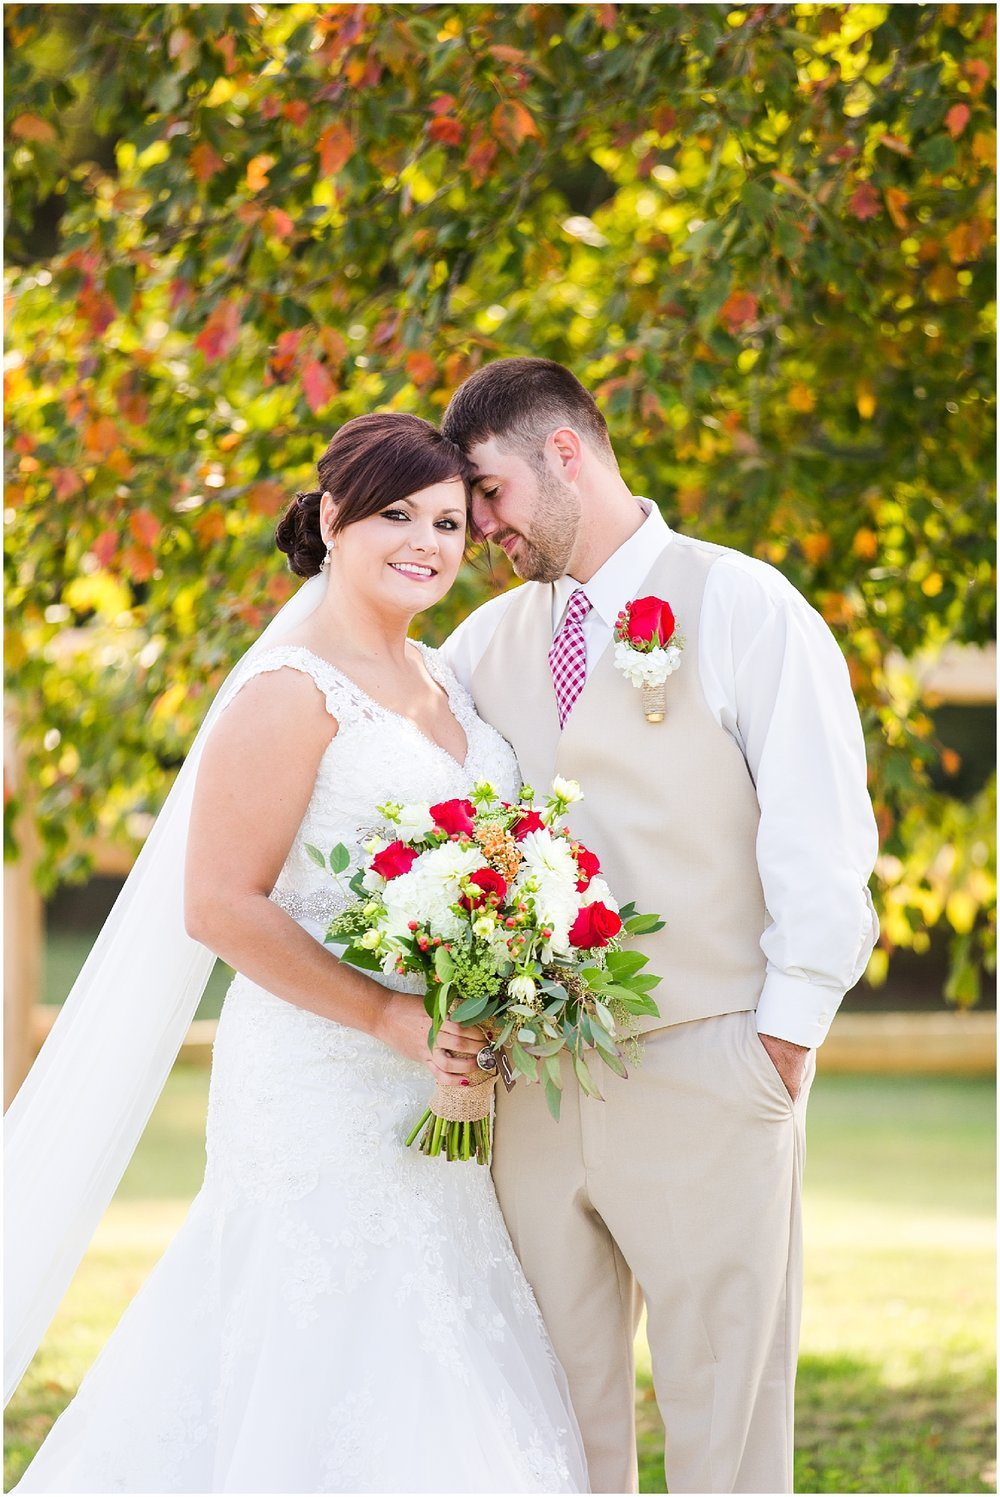 Rustic Country Wedding Virginia Photographer (22).jpg